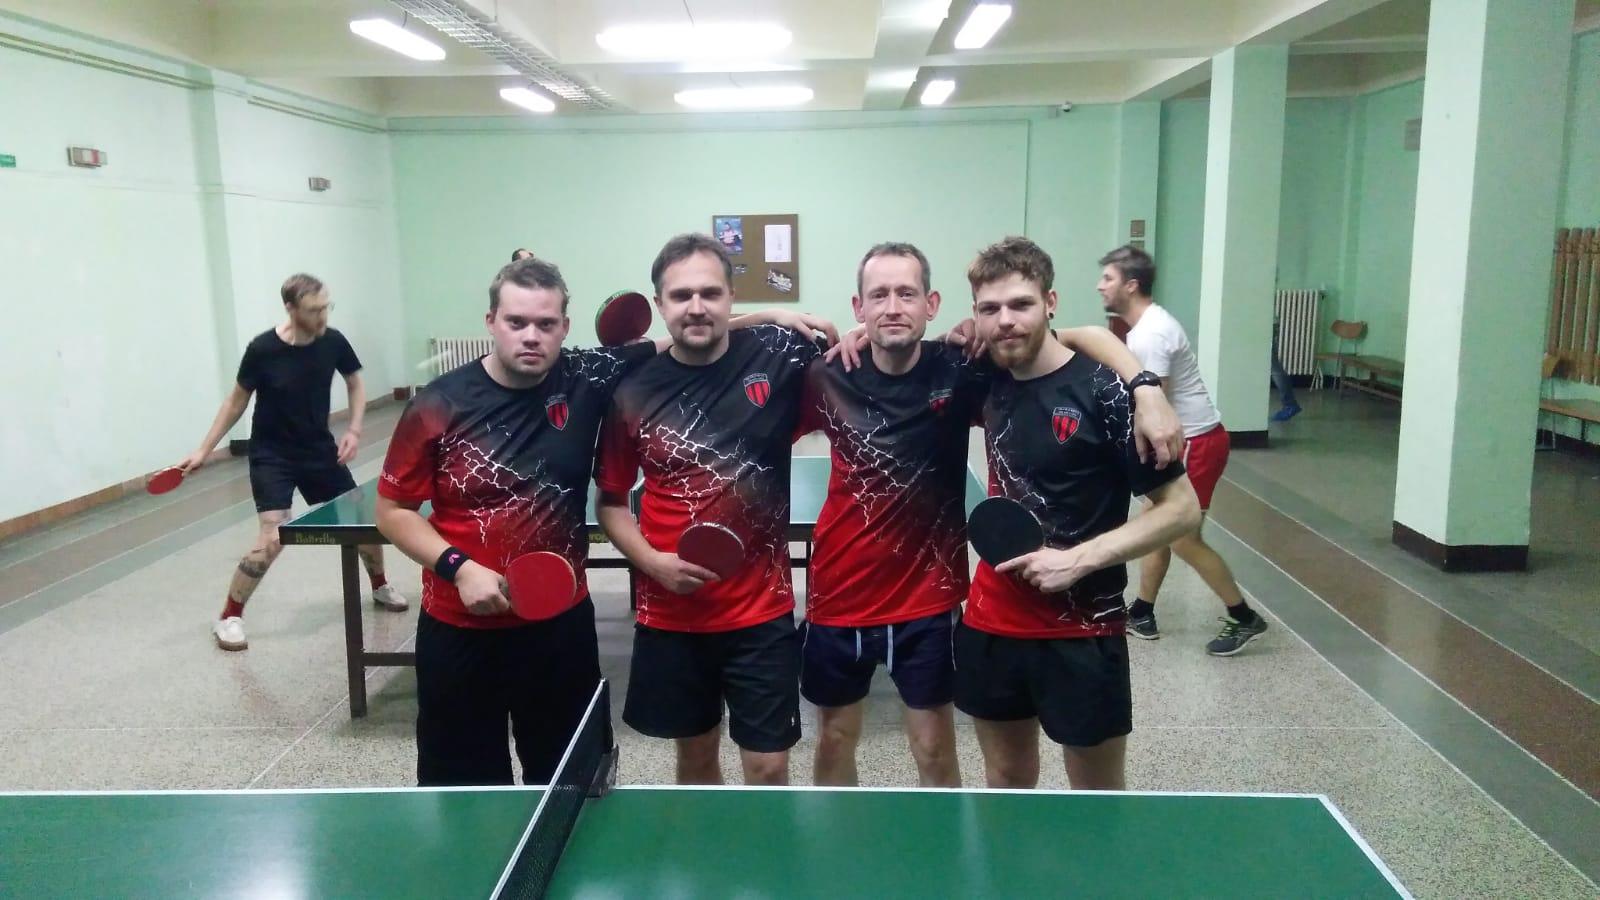 Olympia team